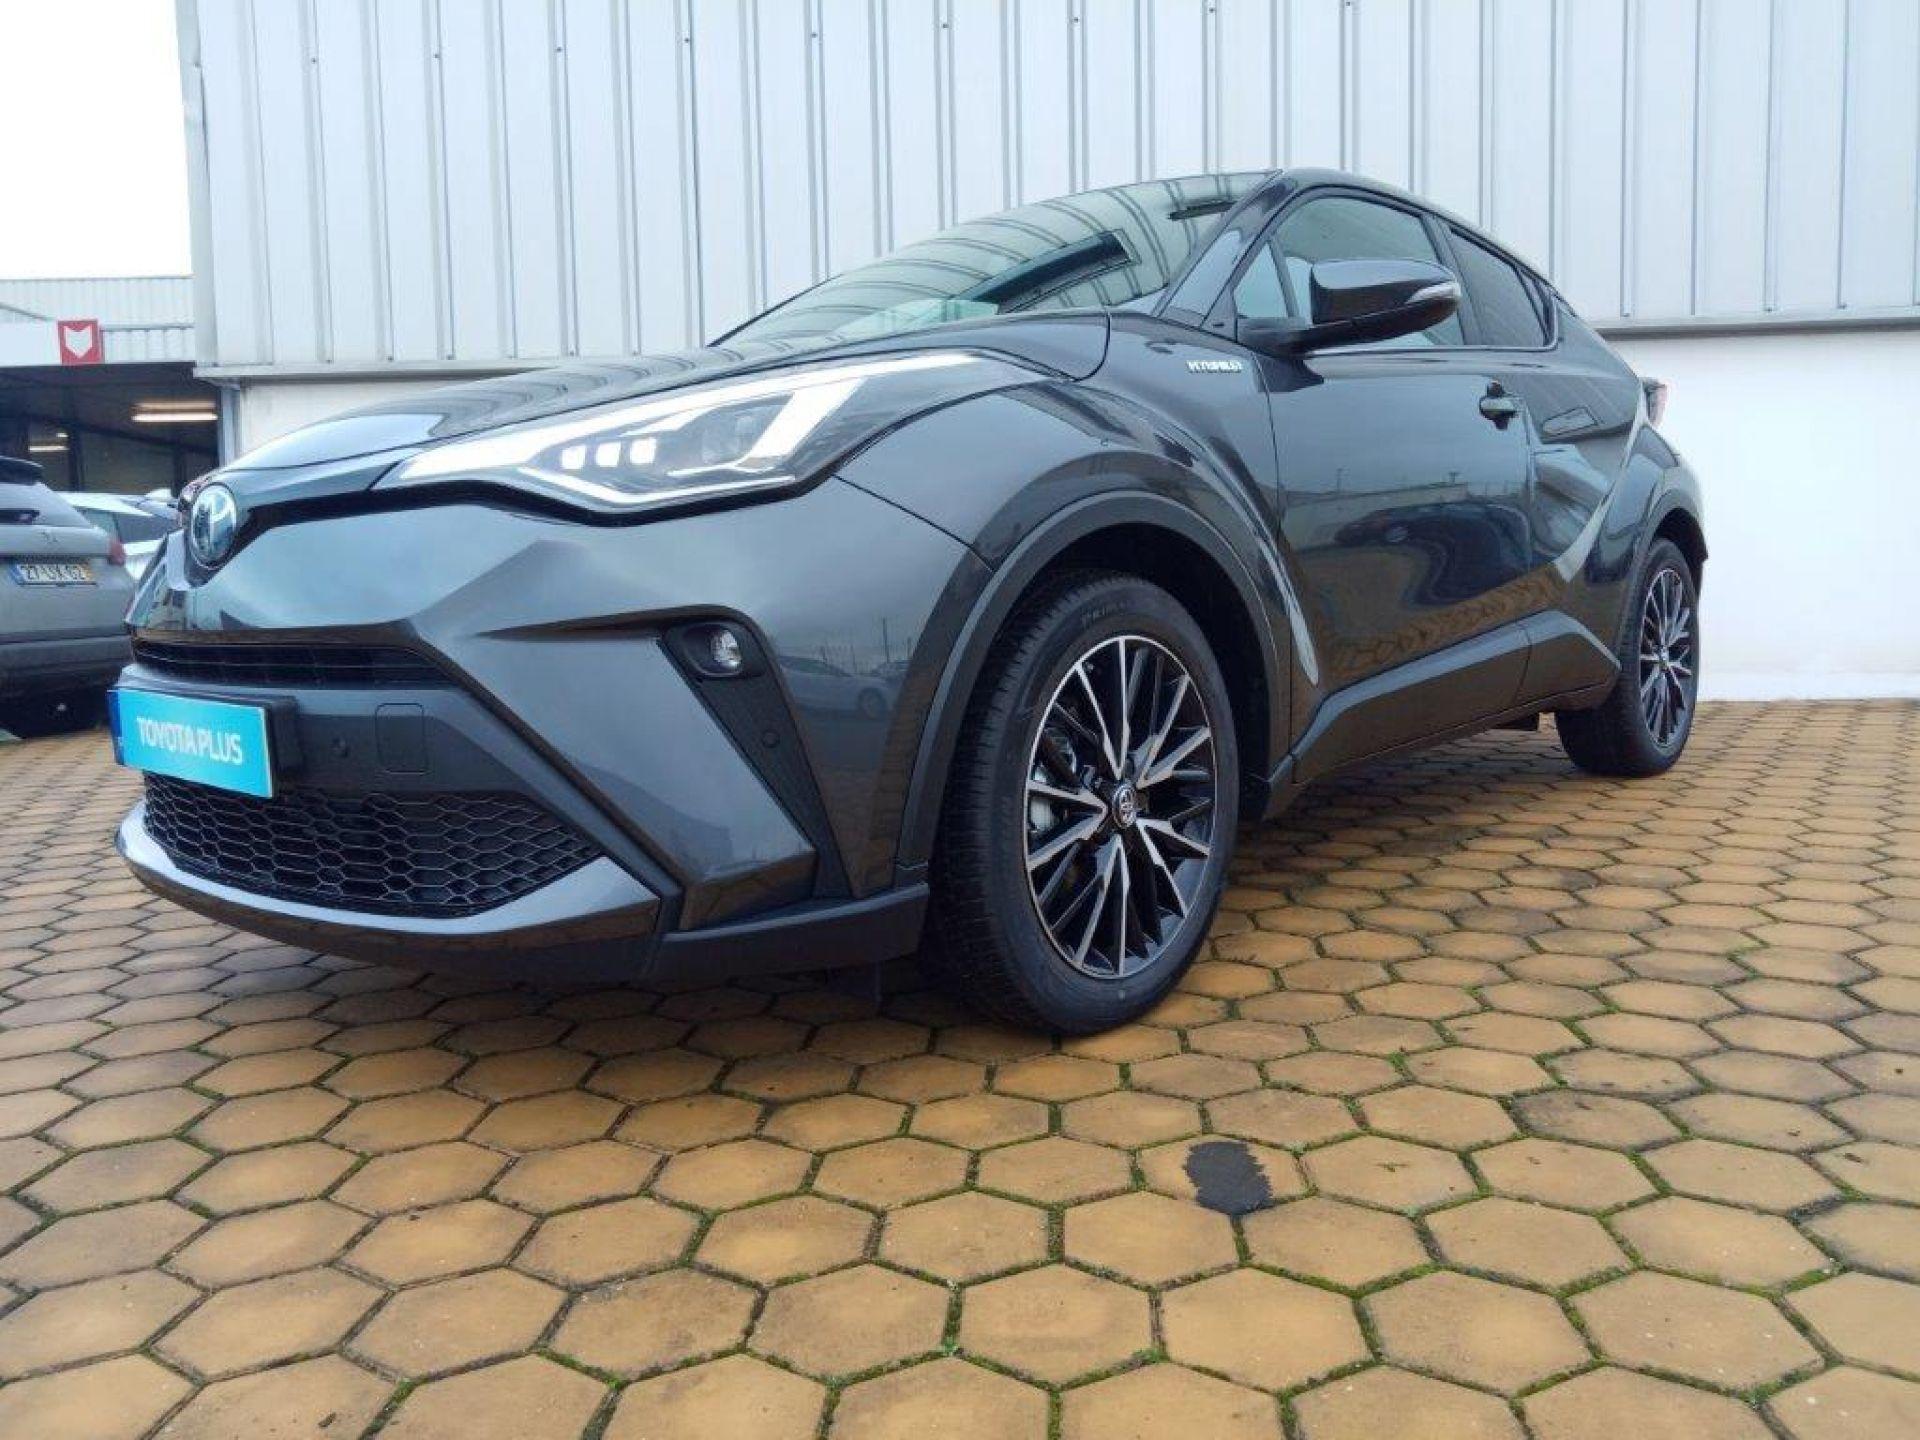 Toyota C-HR C-HR 2.0 Hybrid Dynamic Force Exclusive + Pack Luxury segunda mão Setúbal